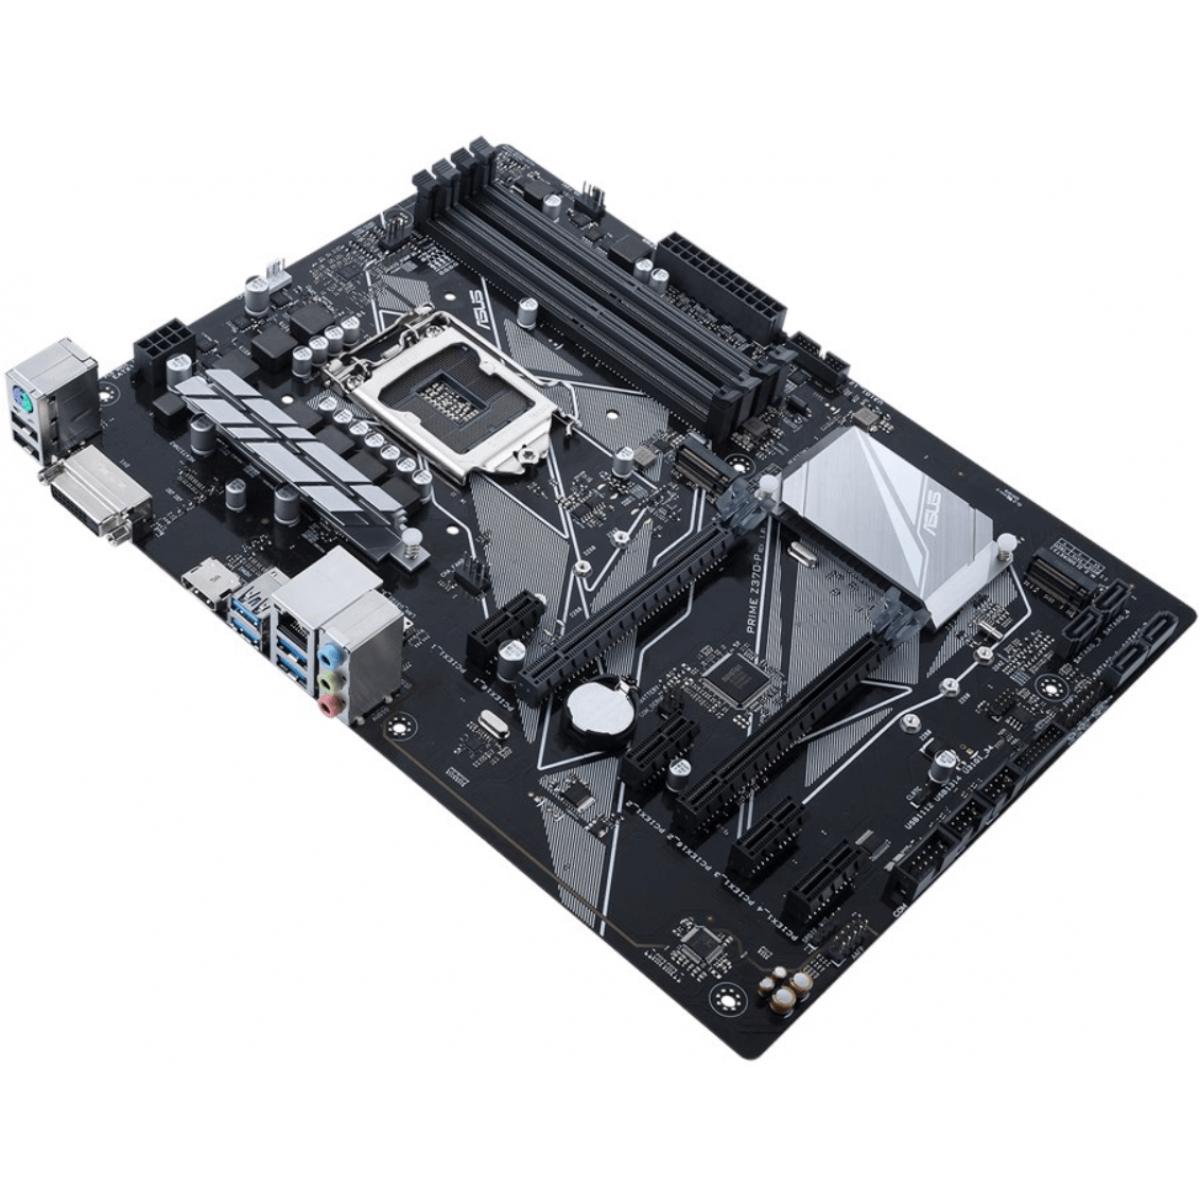 Placa Mãe Asus Prime Z370-P, Chipset Z370, Intel LGA 1151, ATX, DDR4